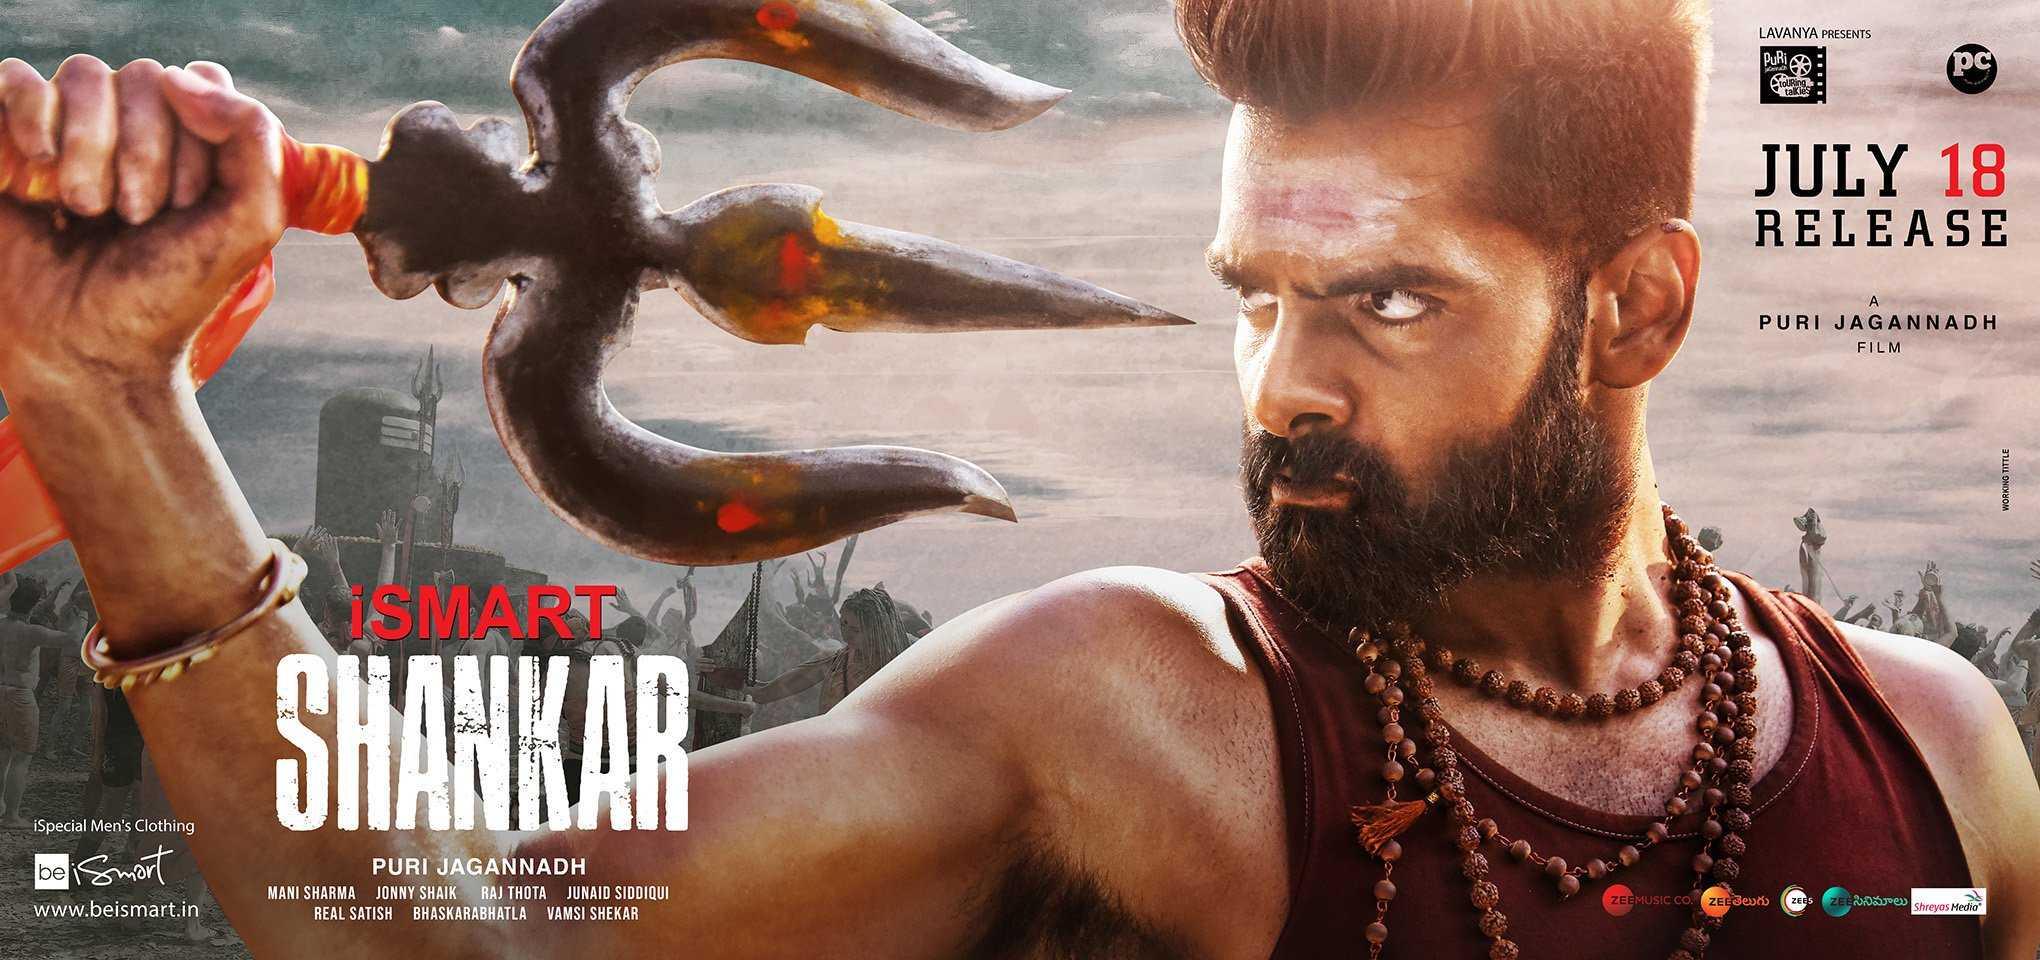 iSmart Shankar official poster